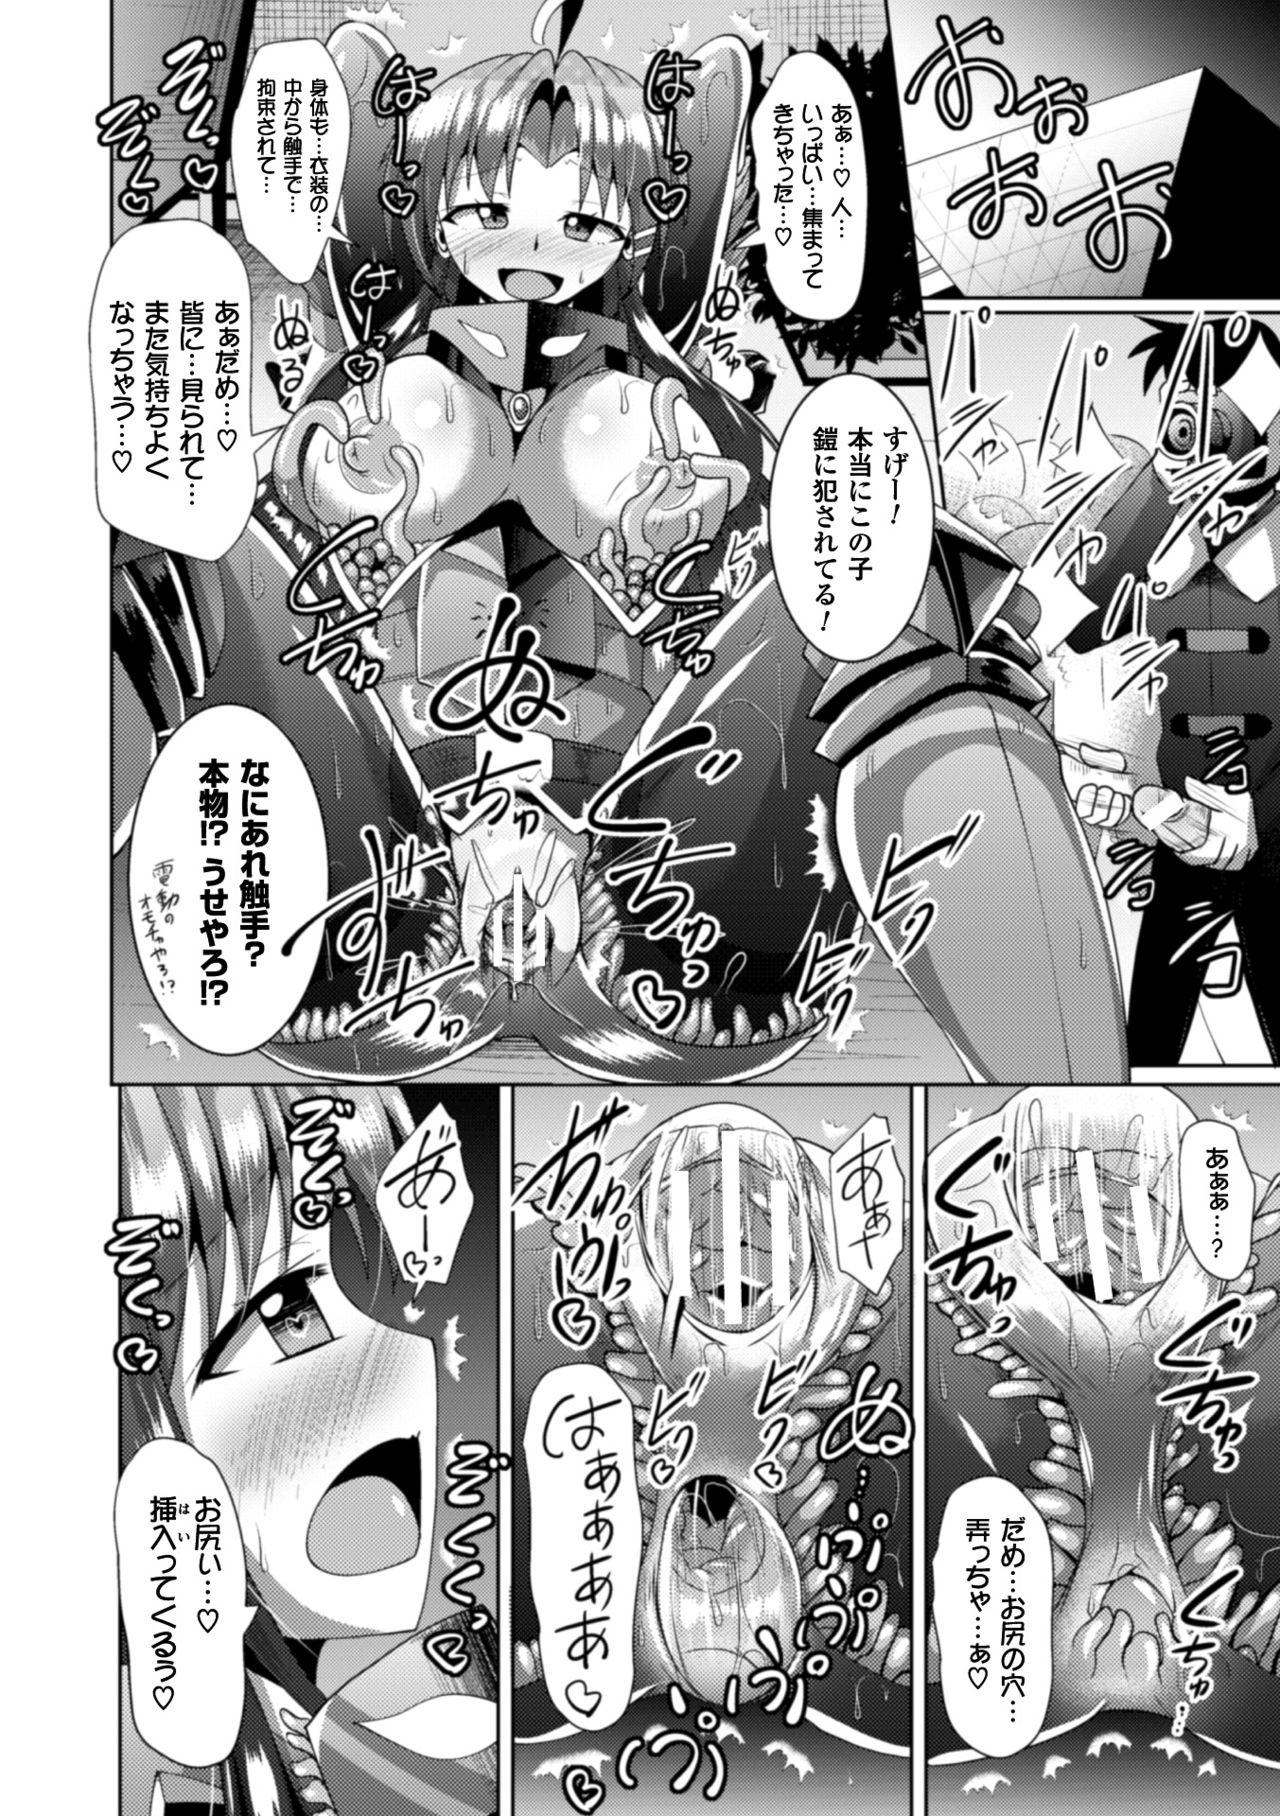 2D Comic Magazine Shokushu Yoroi ni Zenshin o Okasare Mugen Zecchou! Vol. 5 93